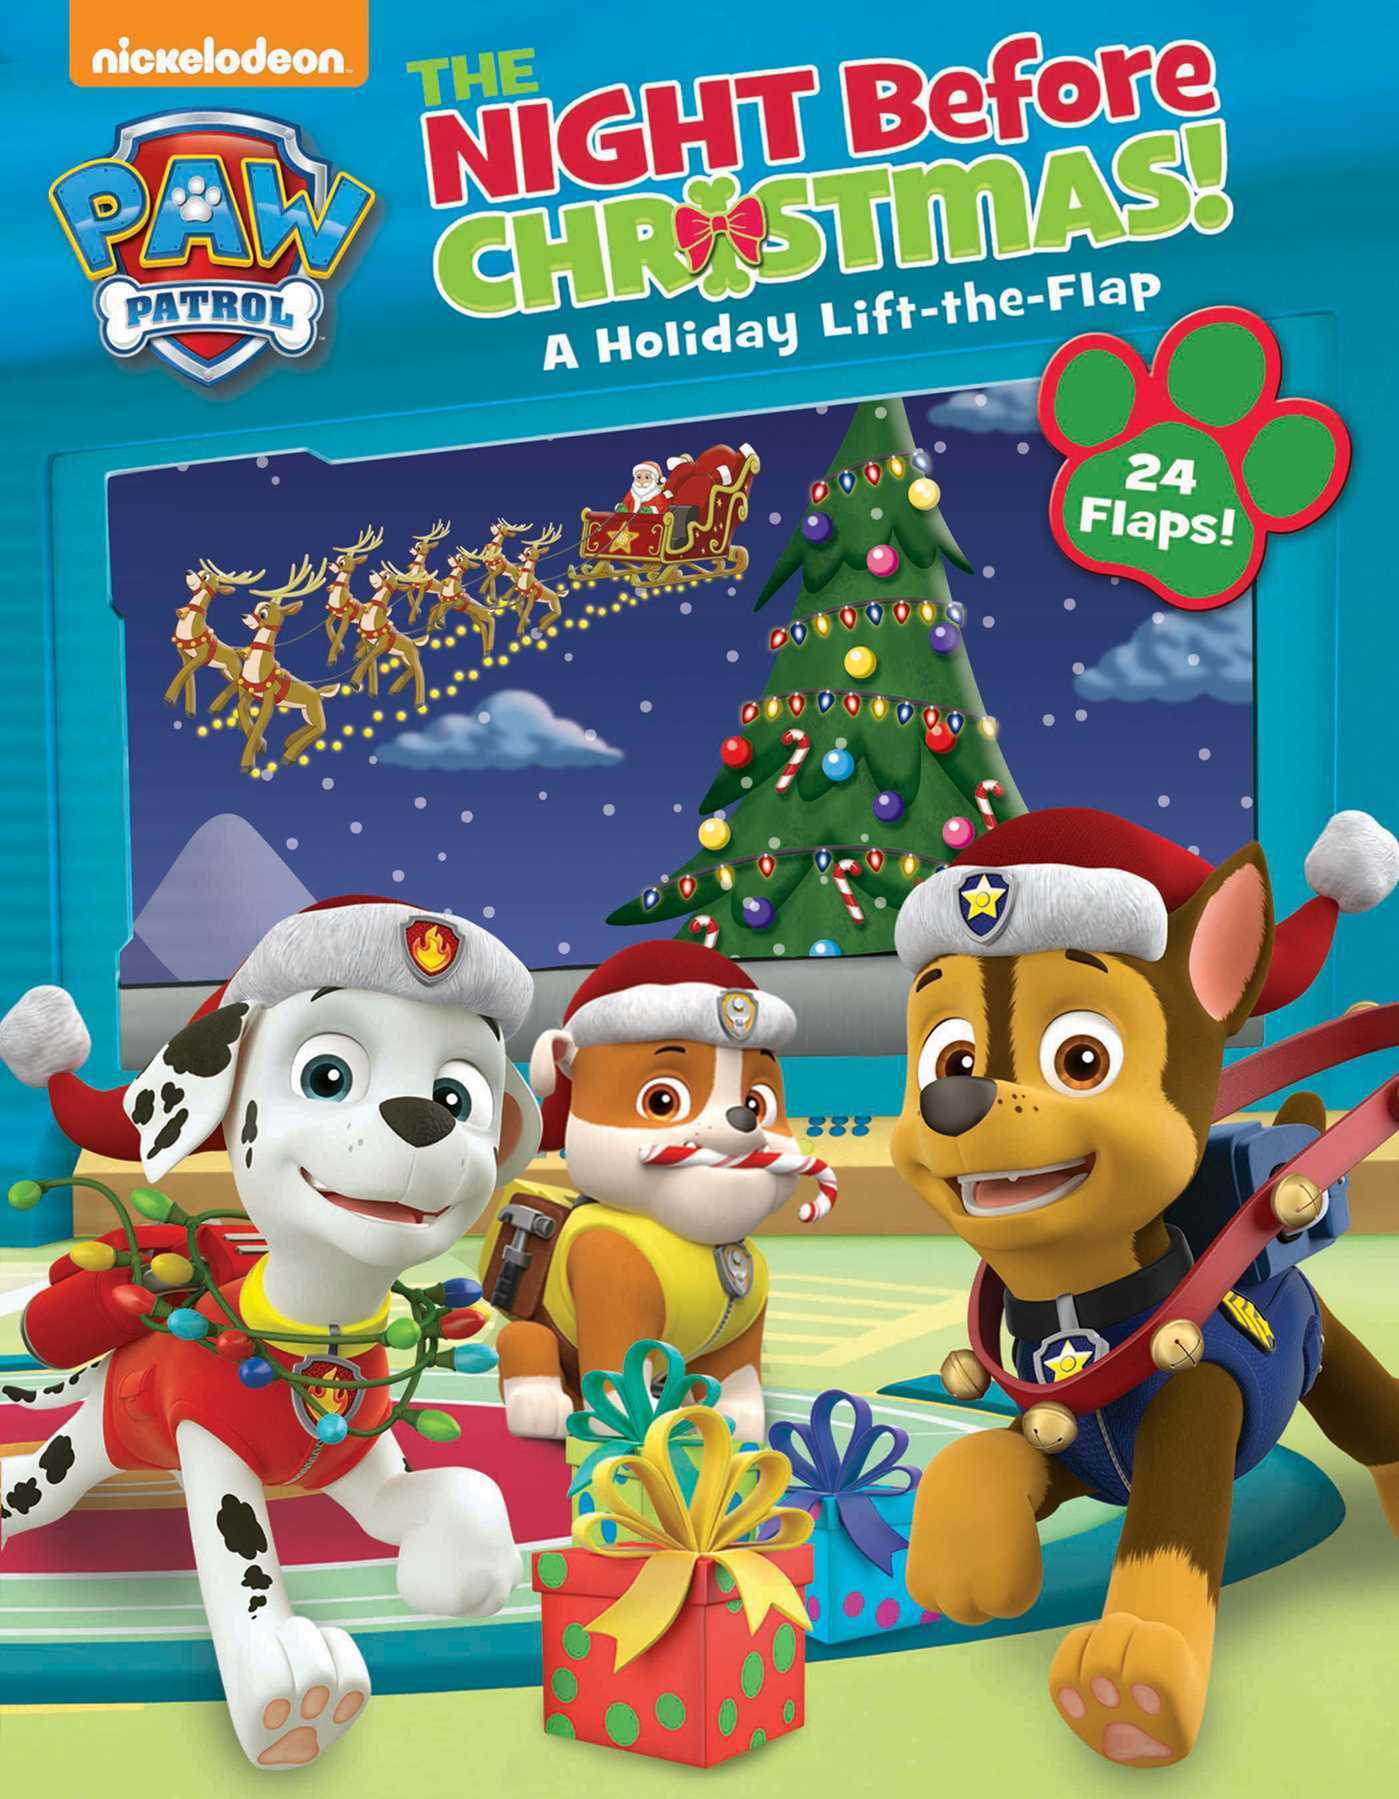 paw patrol the night before christmas 9780794441371 hr